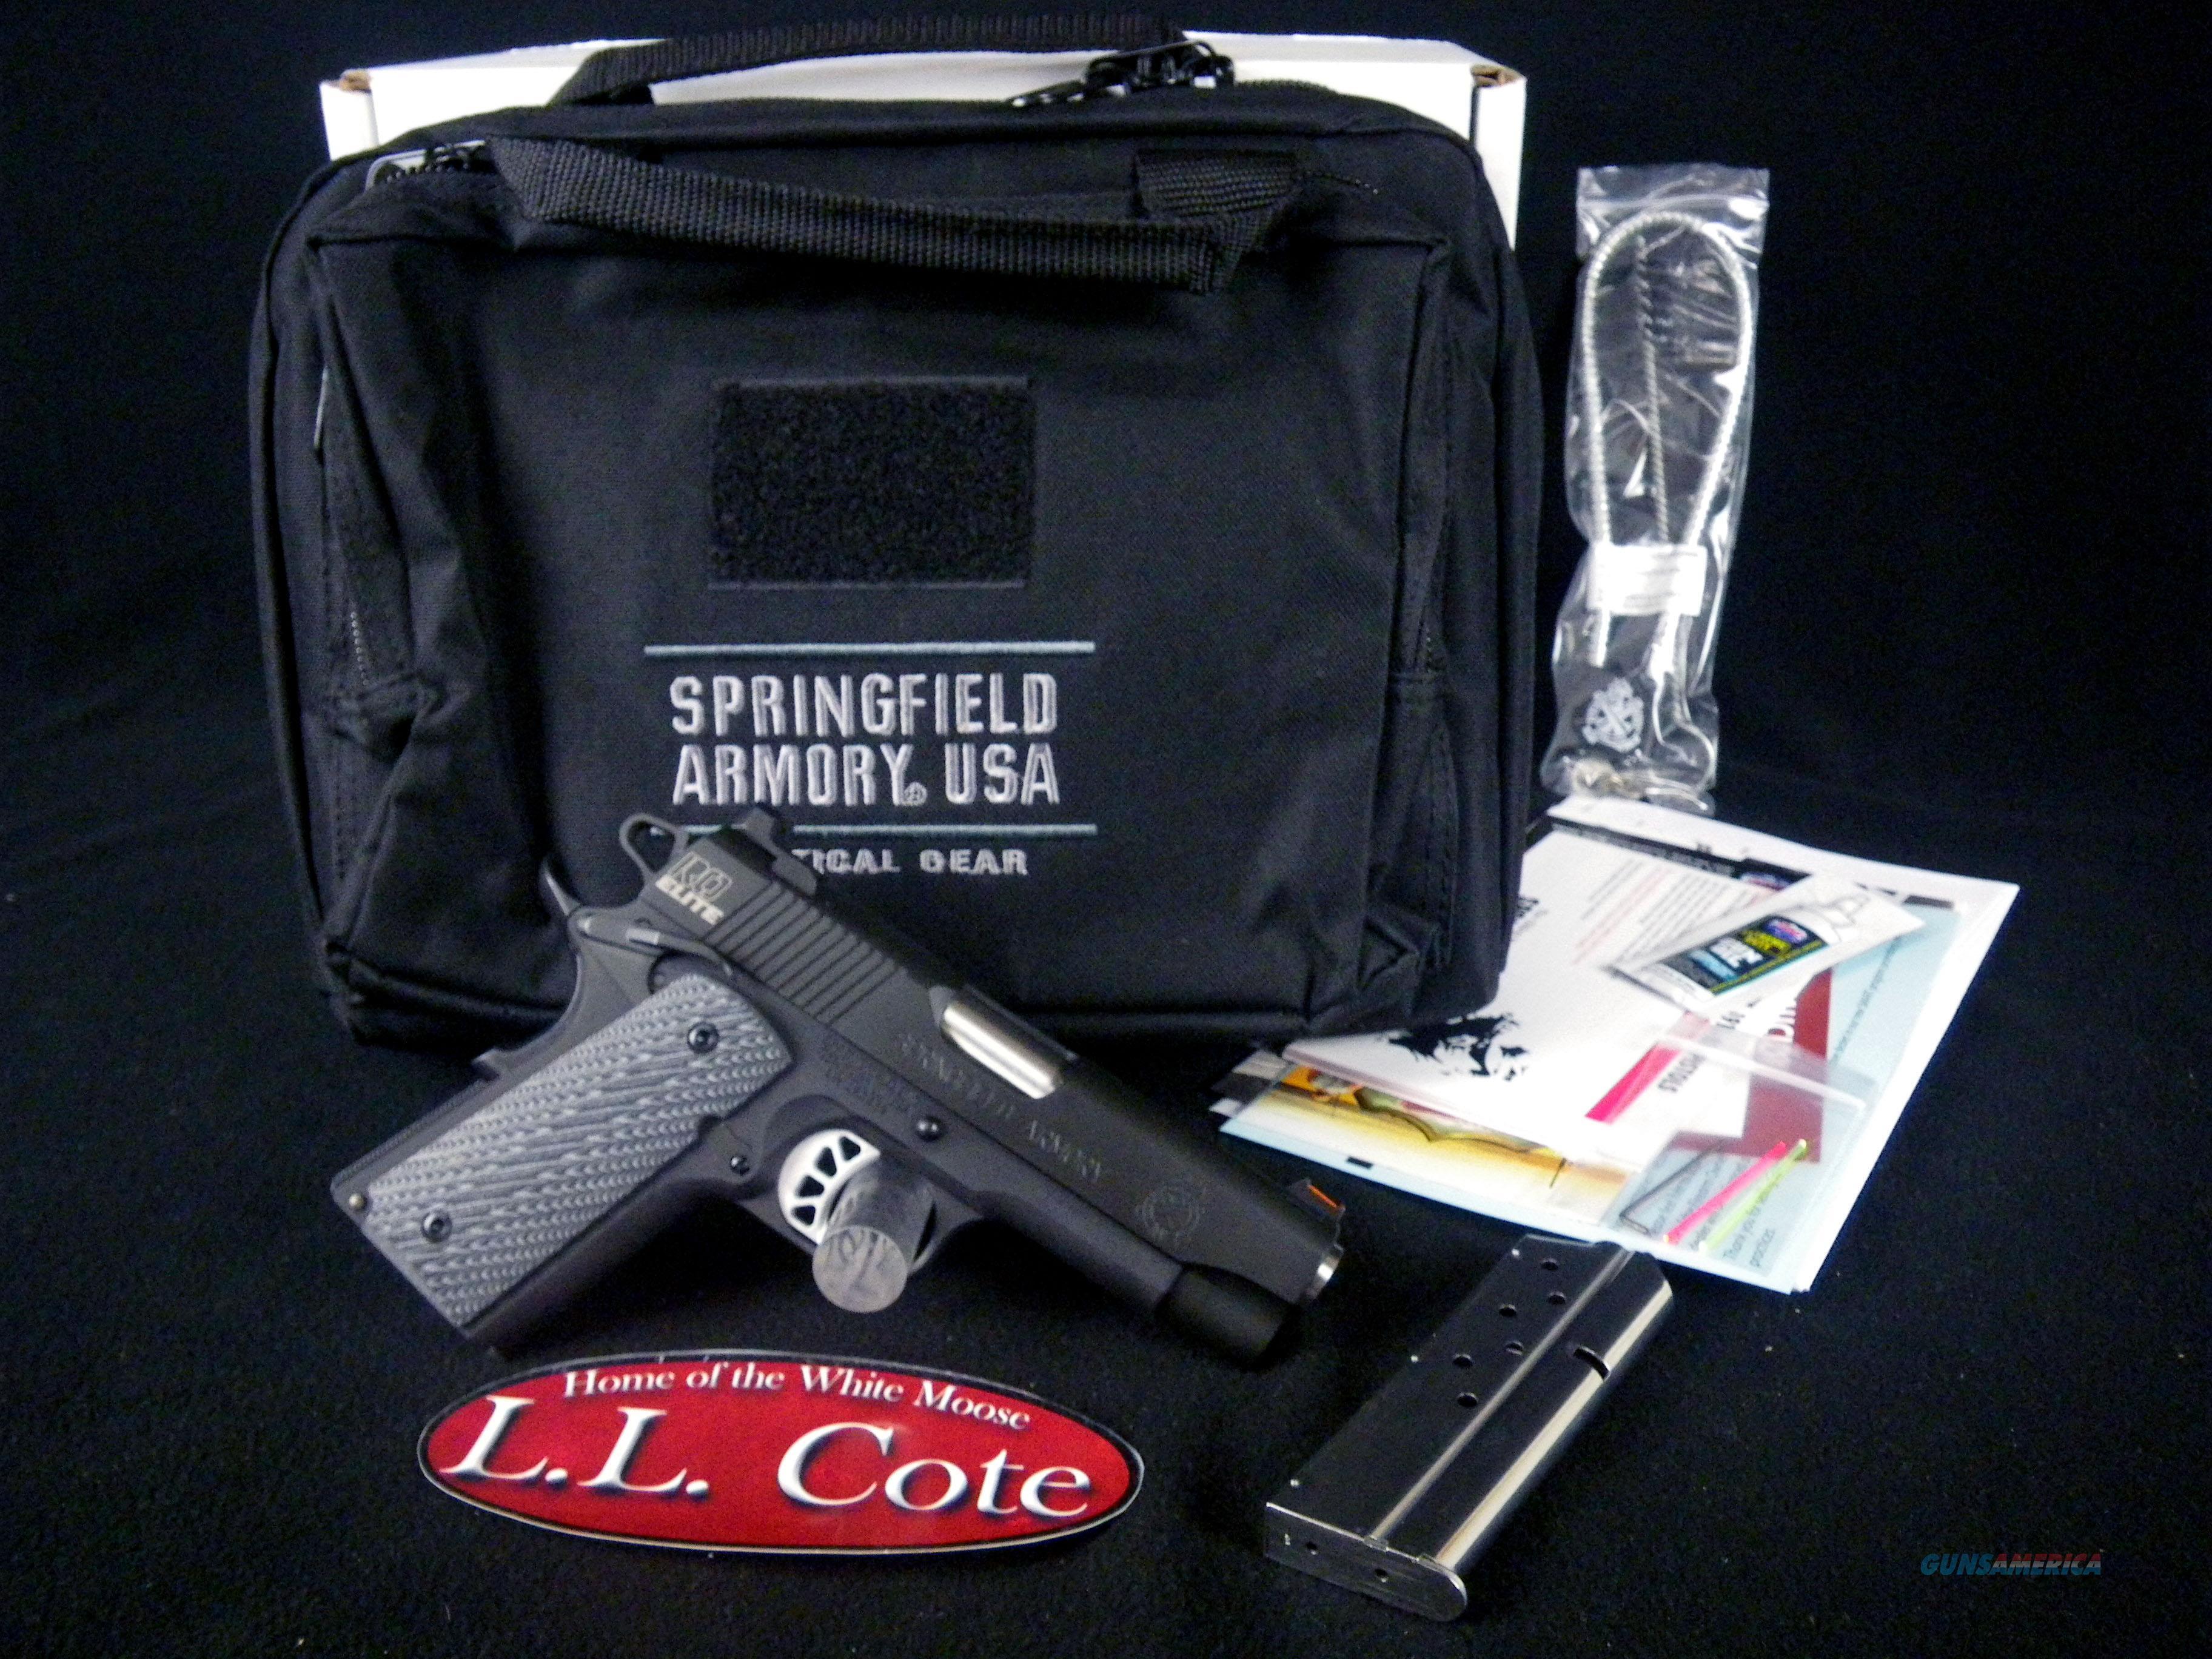 "Springfield 1911 Range Officer Elite Cmpct 9mm 4"" NEW PI9125E  Guns > Pistols > Springfield Armory Pistols > 1911 Type"